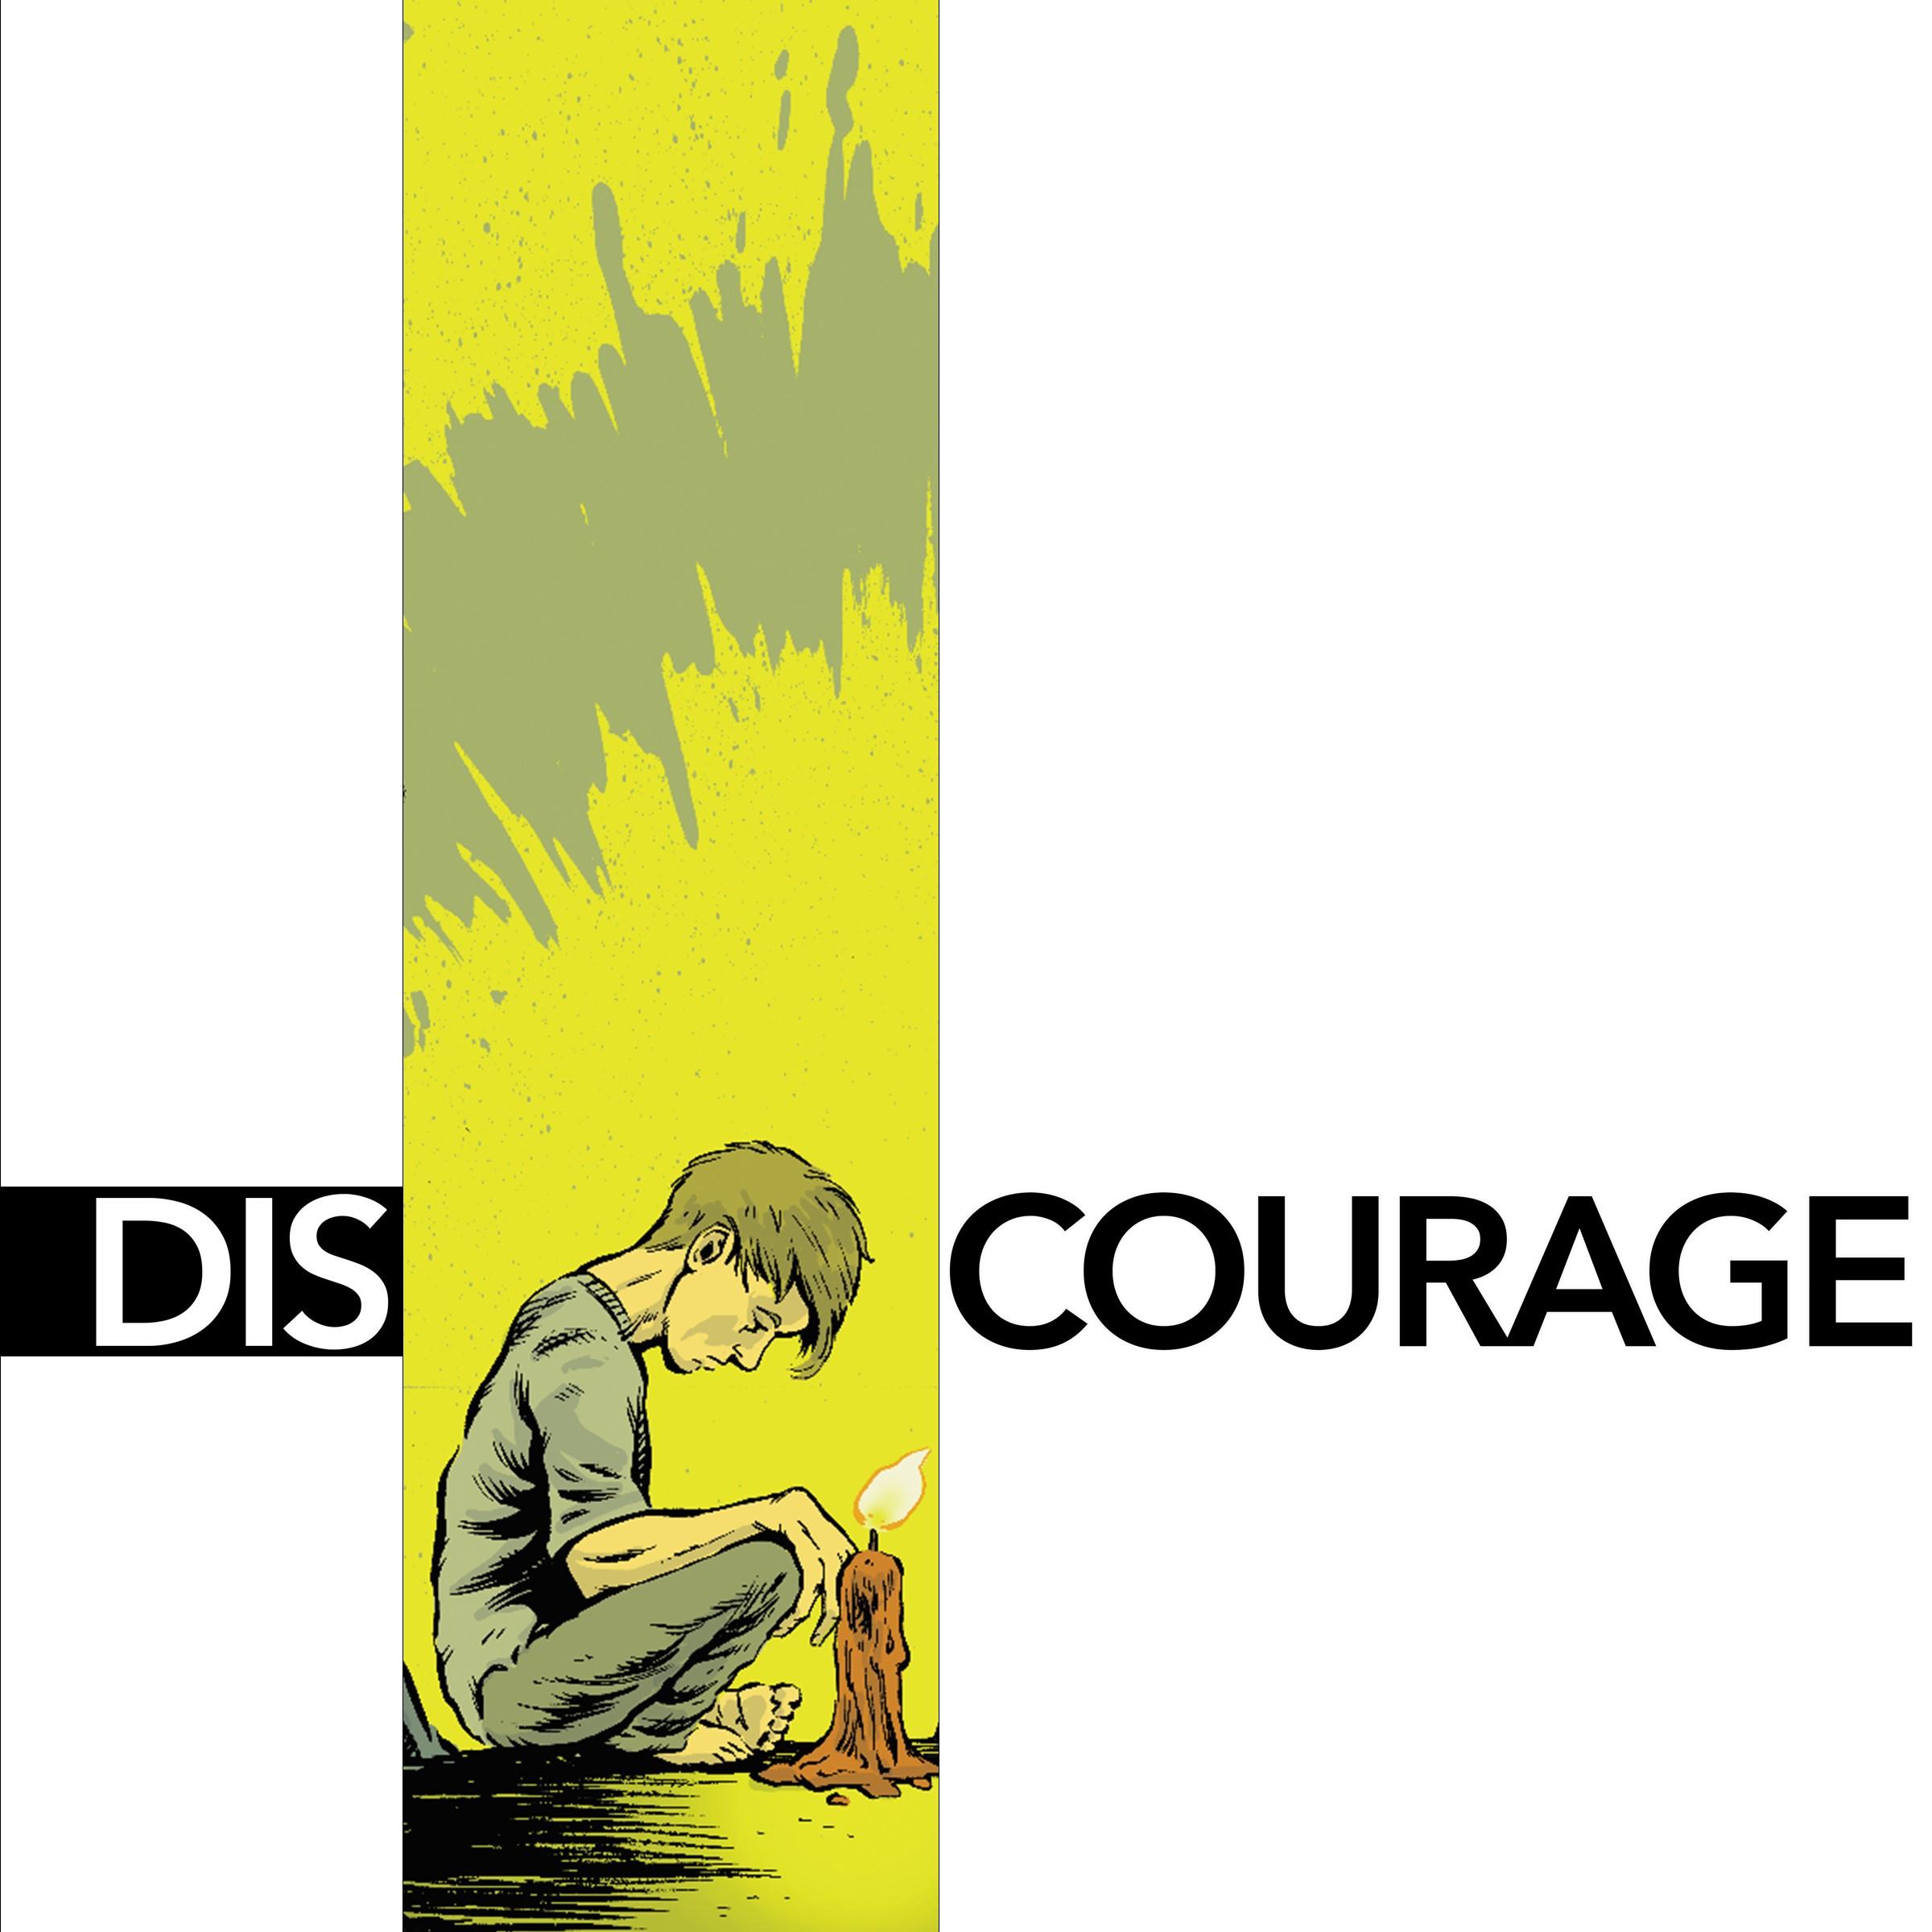 Discourage-S/T 7